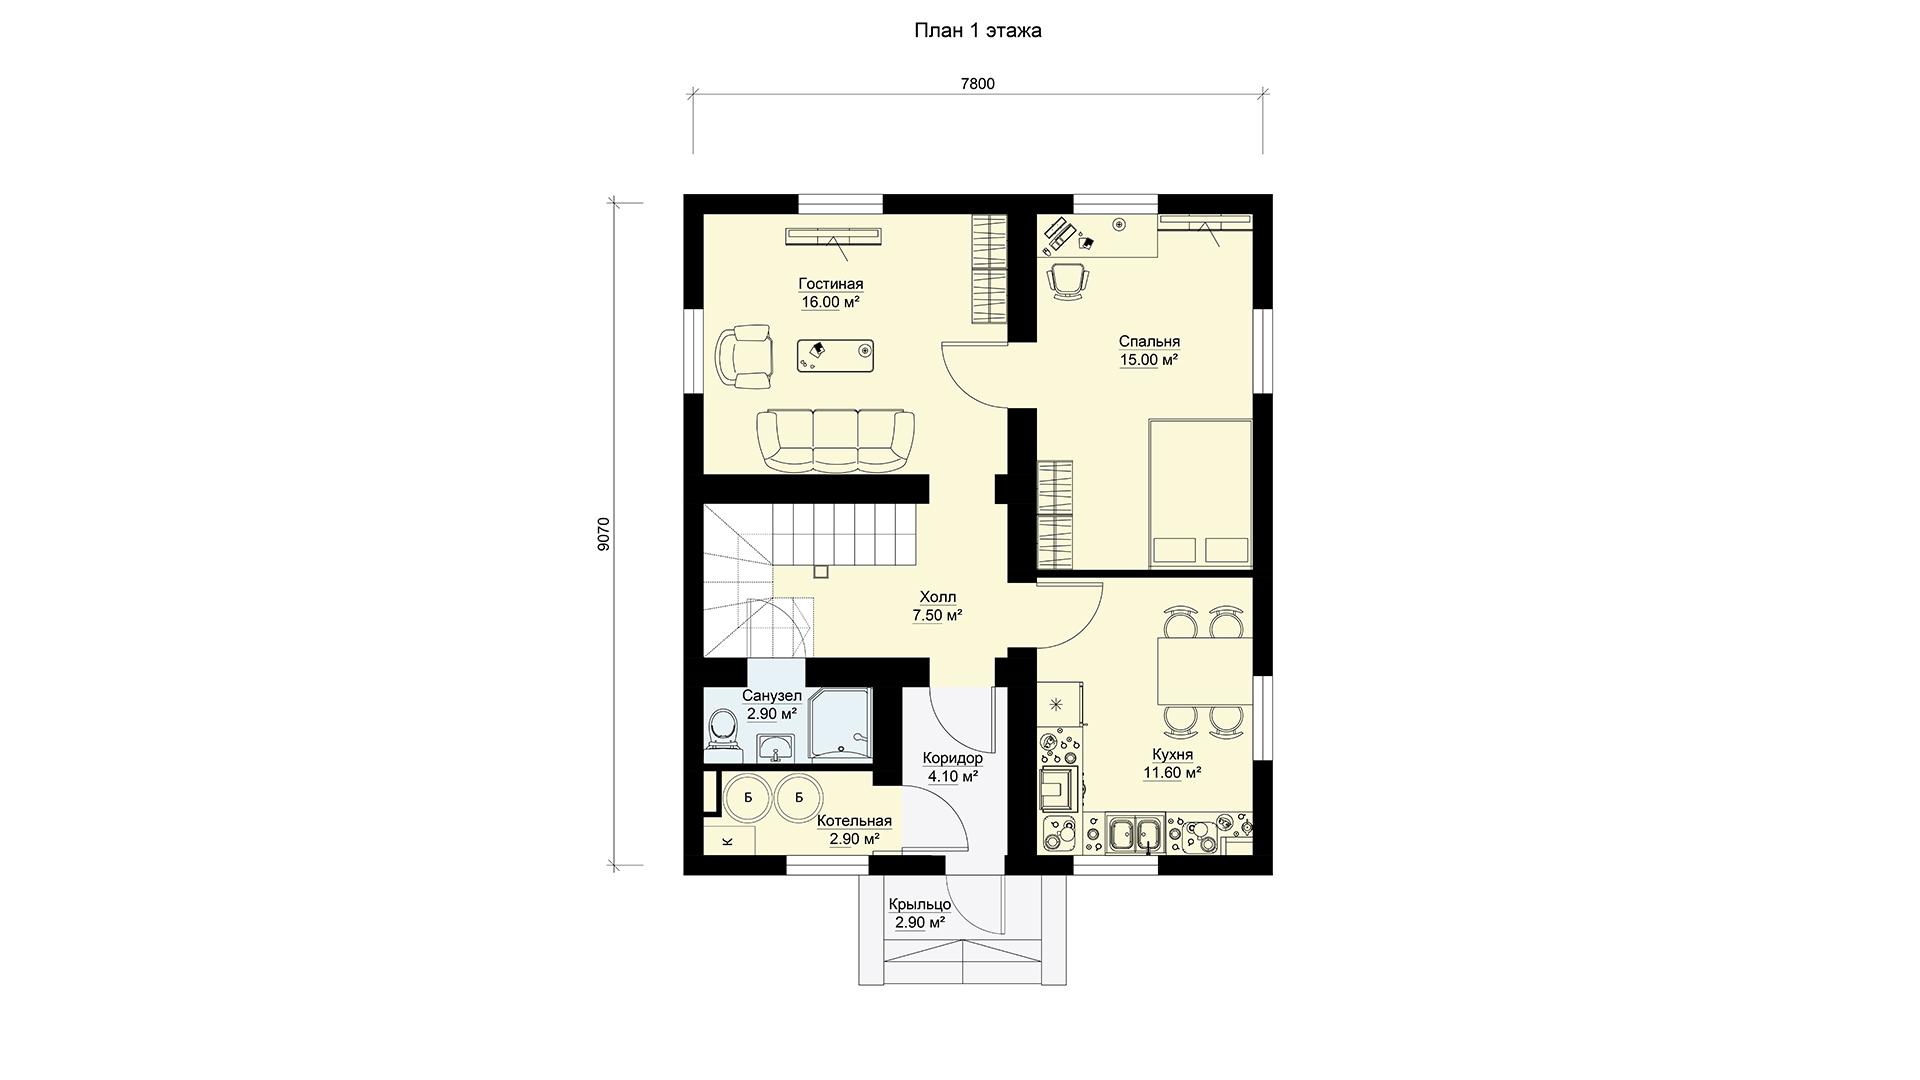 План первого этажа двухэтажного мансардного дома, проект БЭНПАН МС-121.